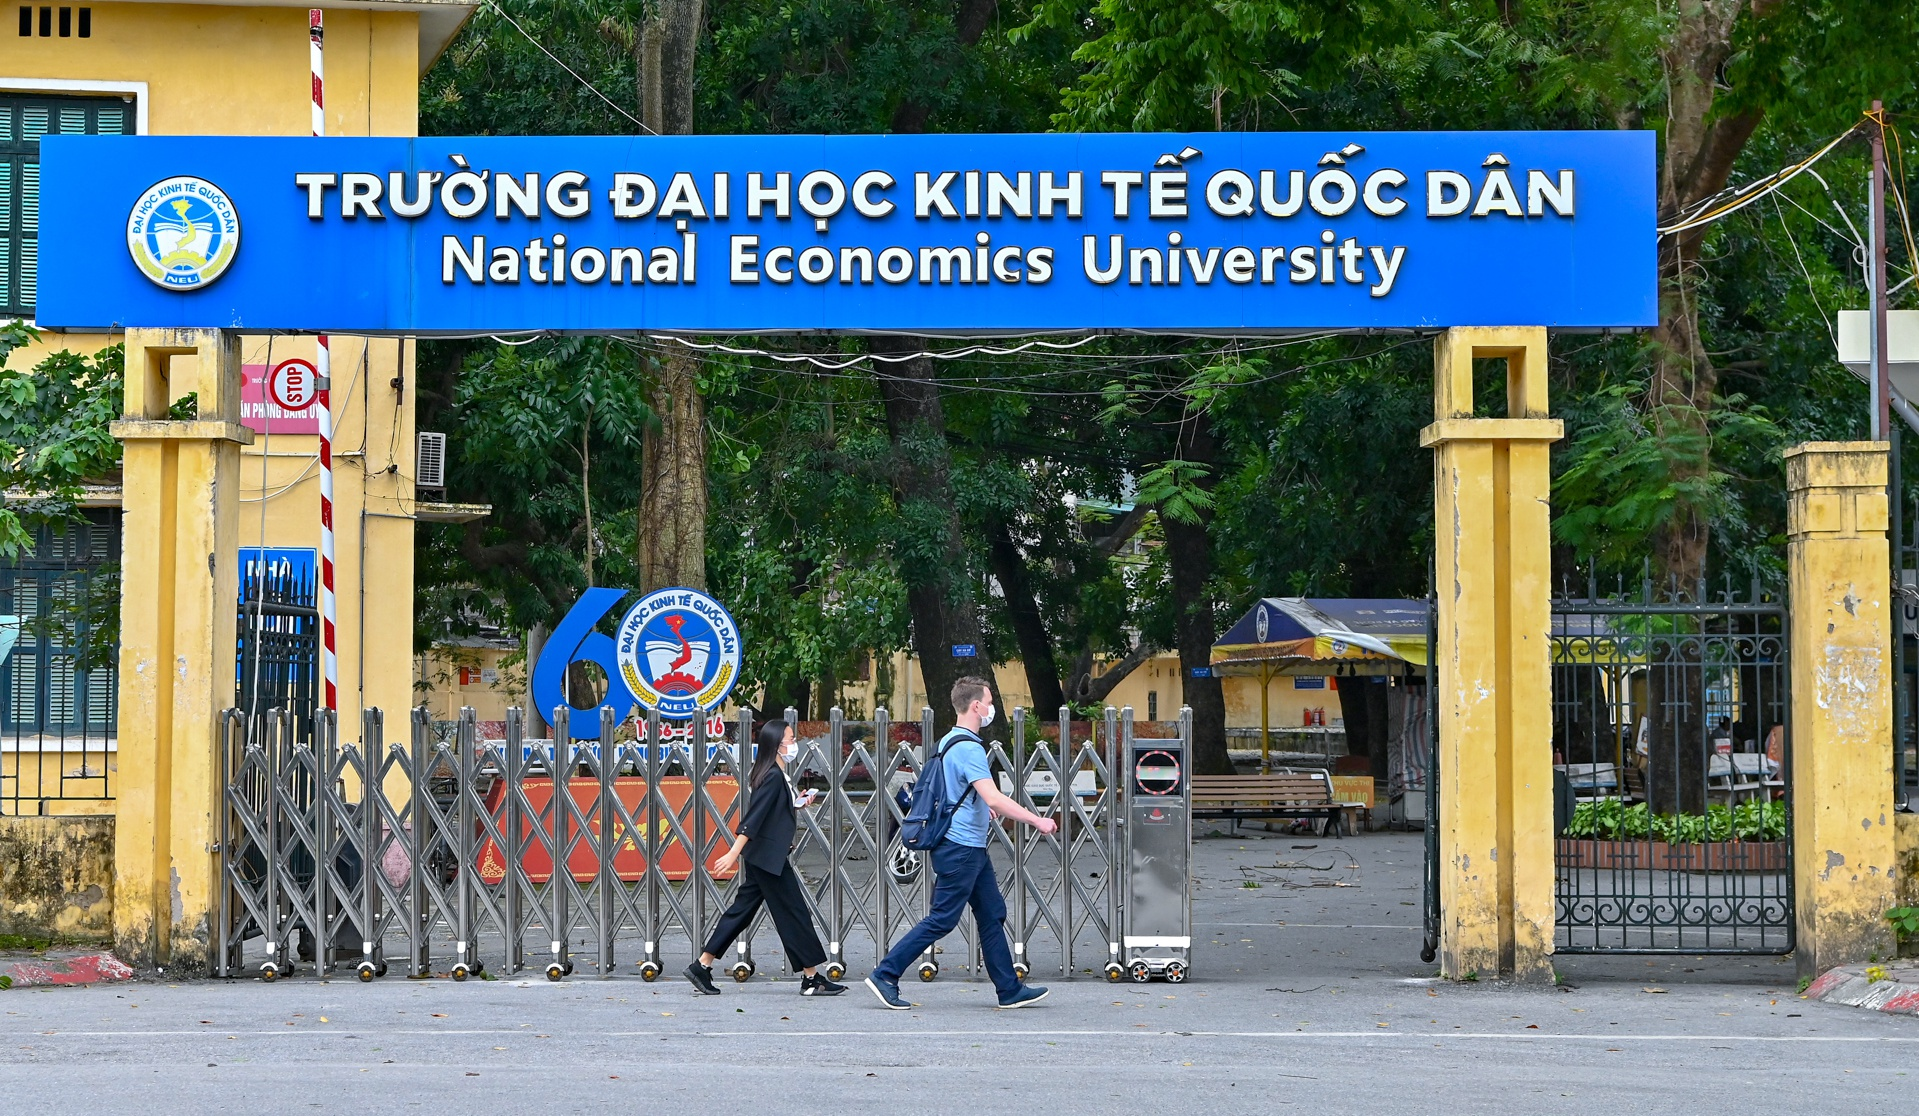 Duong pho Ha Noi vang nhu Tet vi dich Covid-19 hinh anh 9 hanoivangnhutet10_zing.jpg